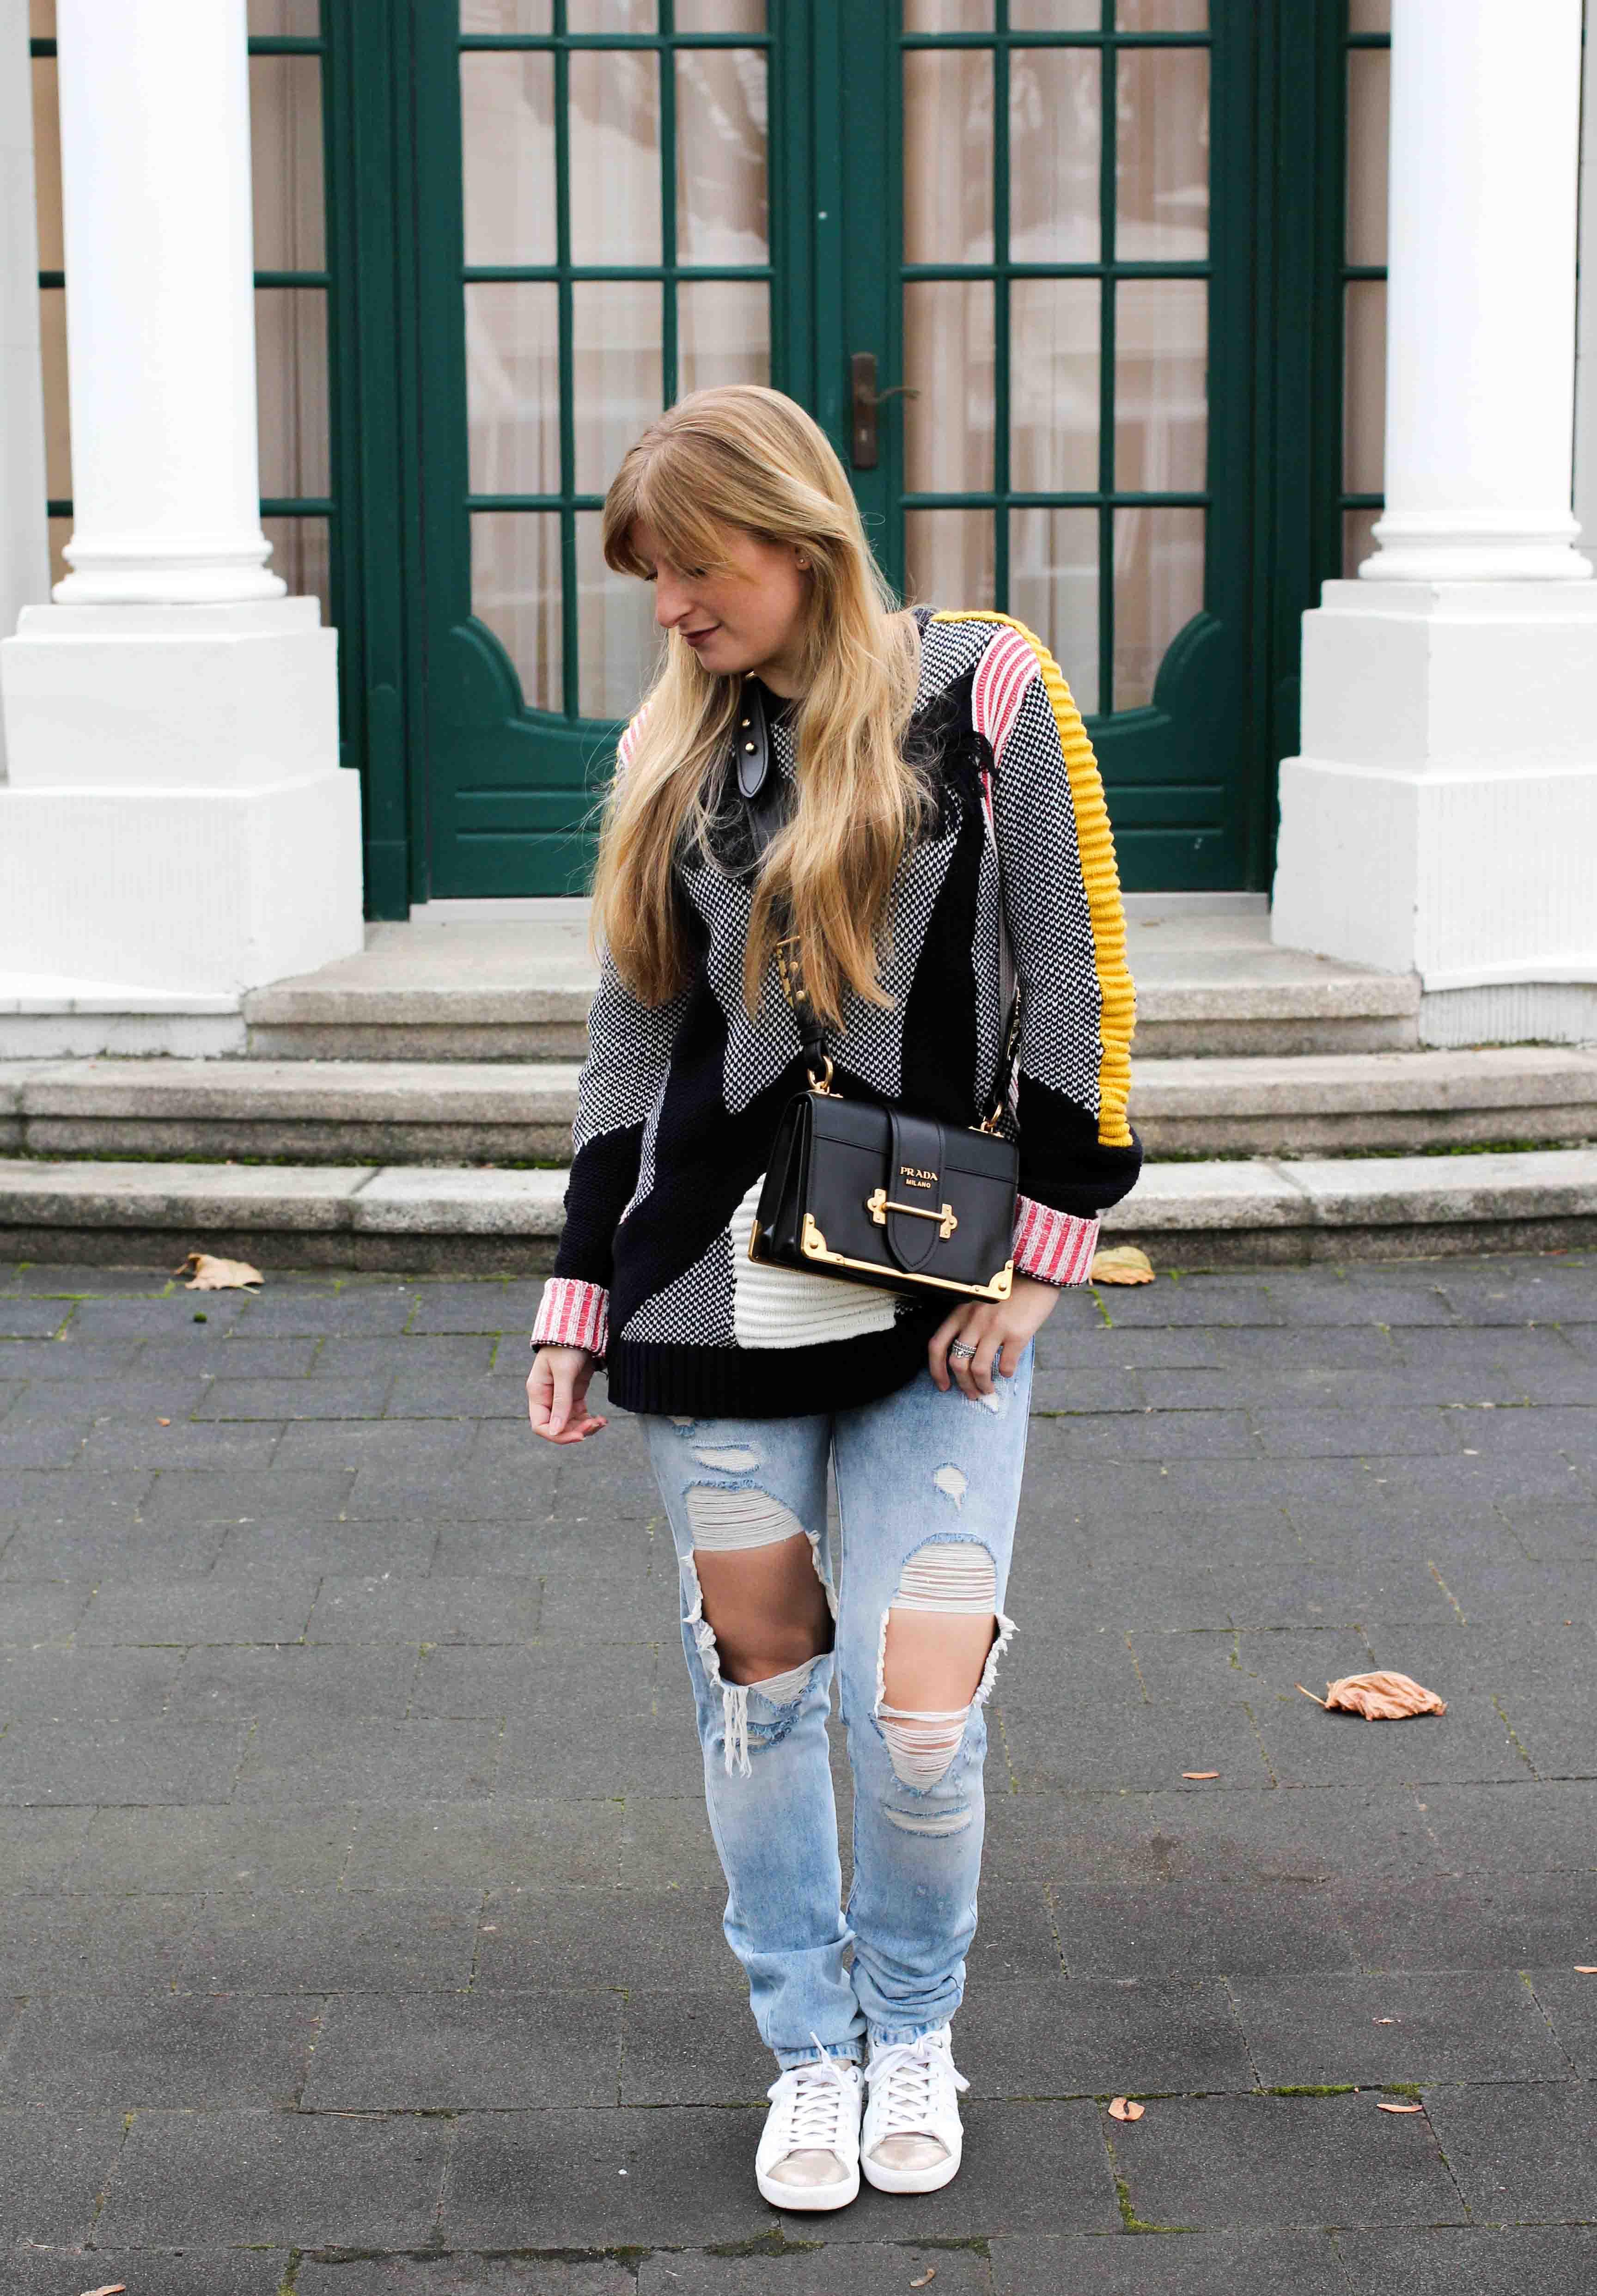 Bunter Wollpullover Asos Statementpullover Ripped Jeans Fashion Blog weiße Sneaker 5